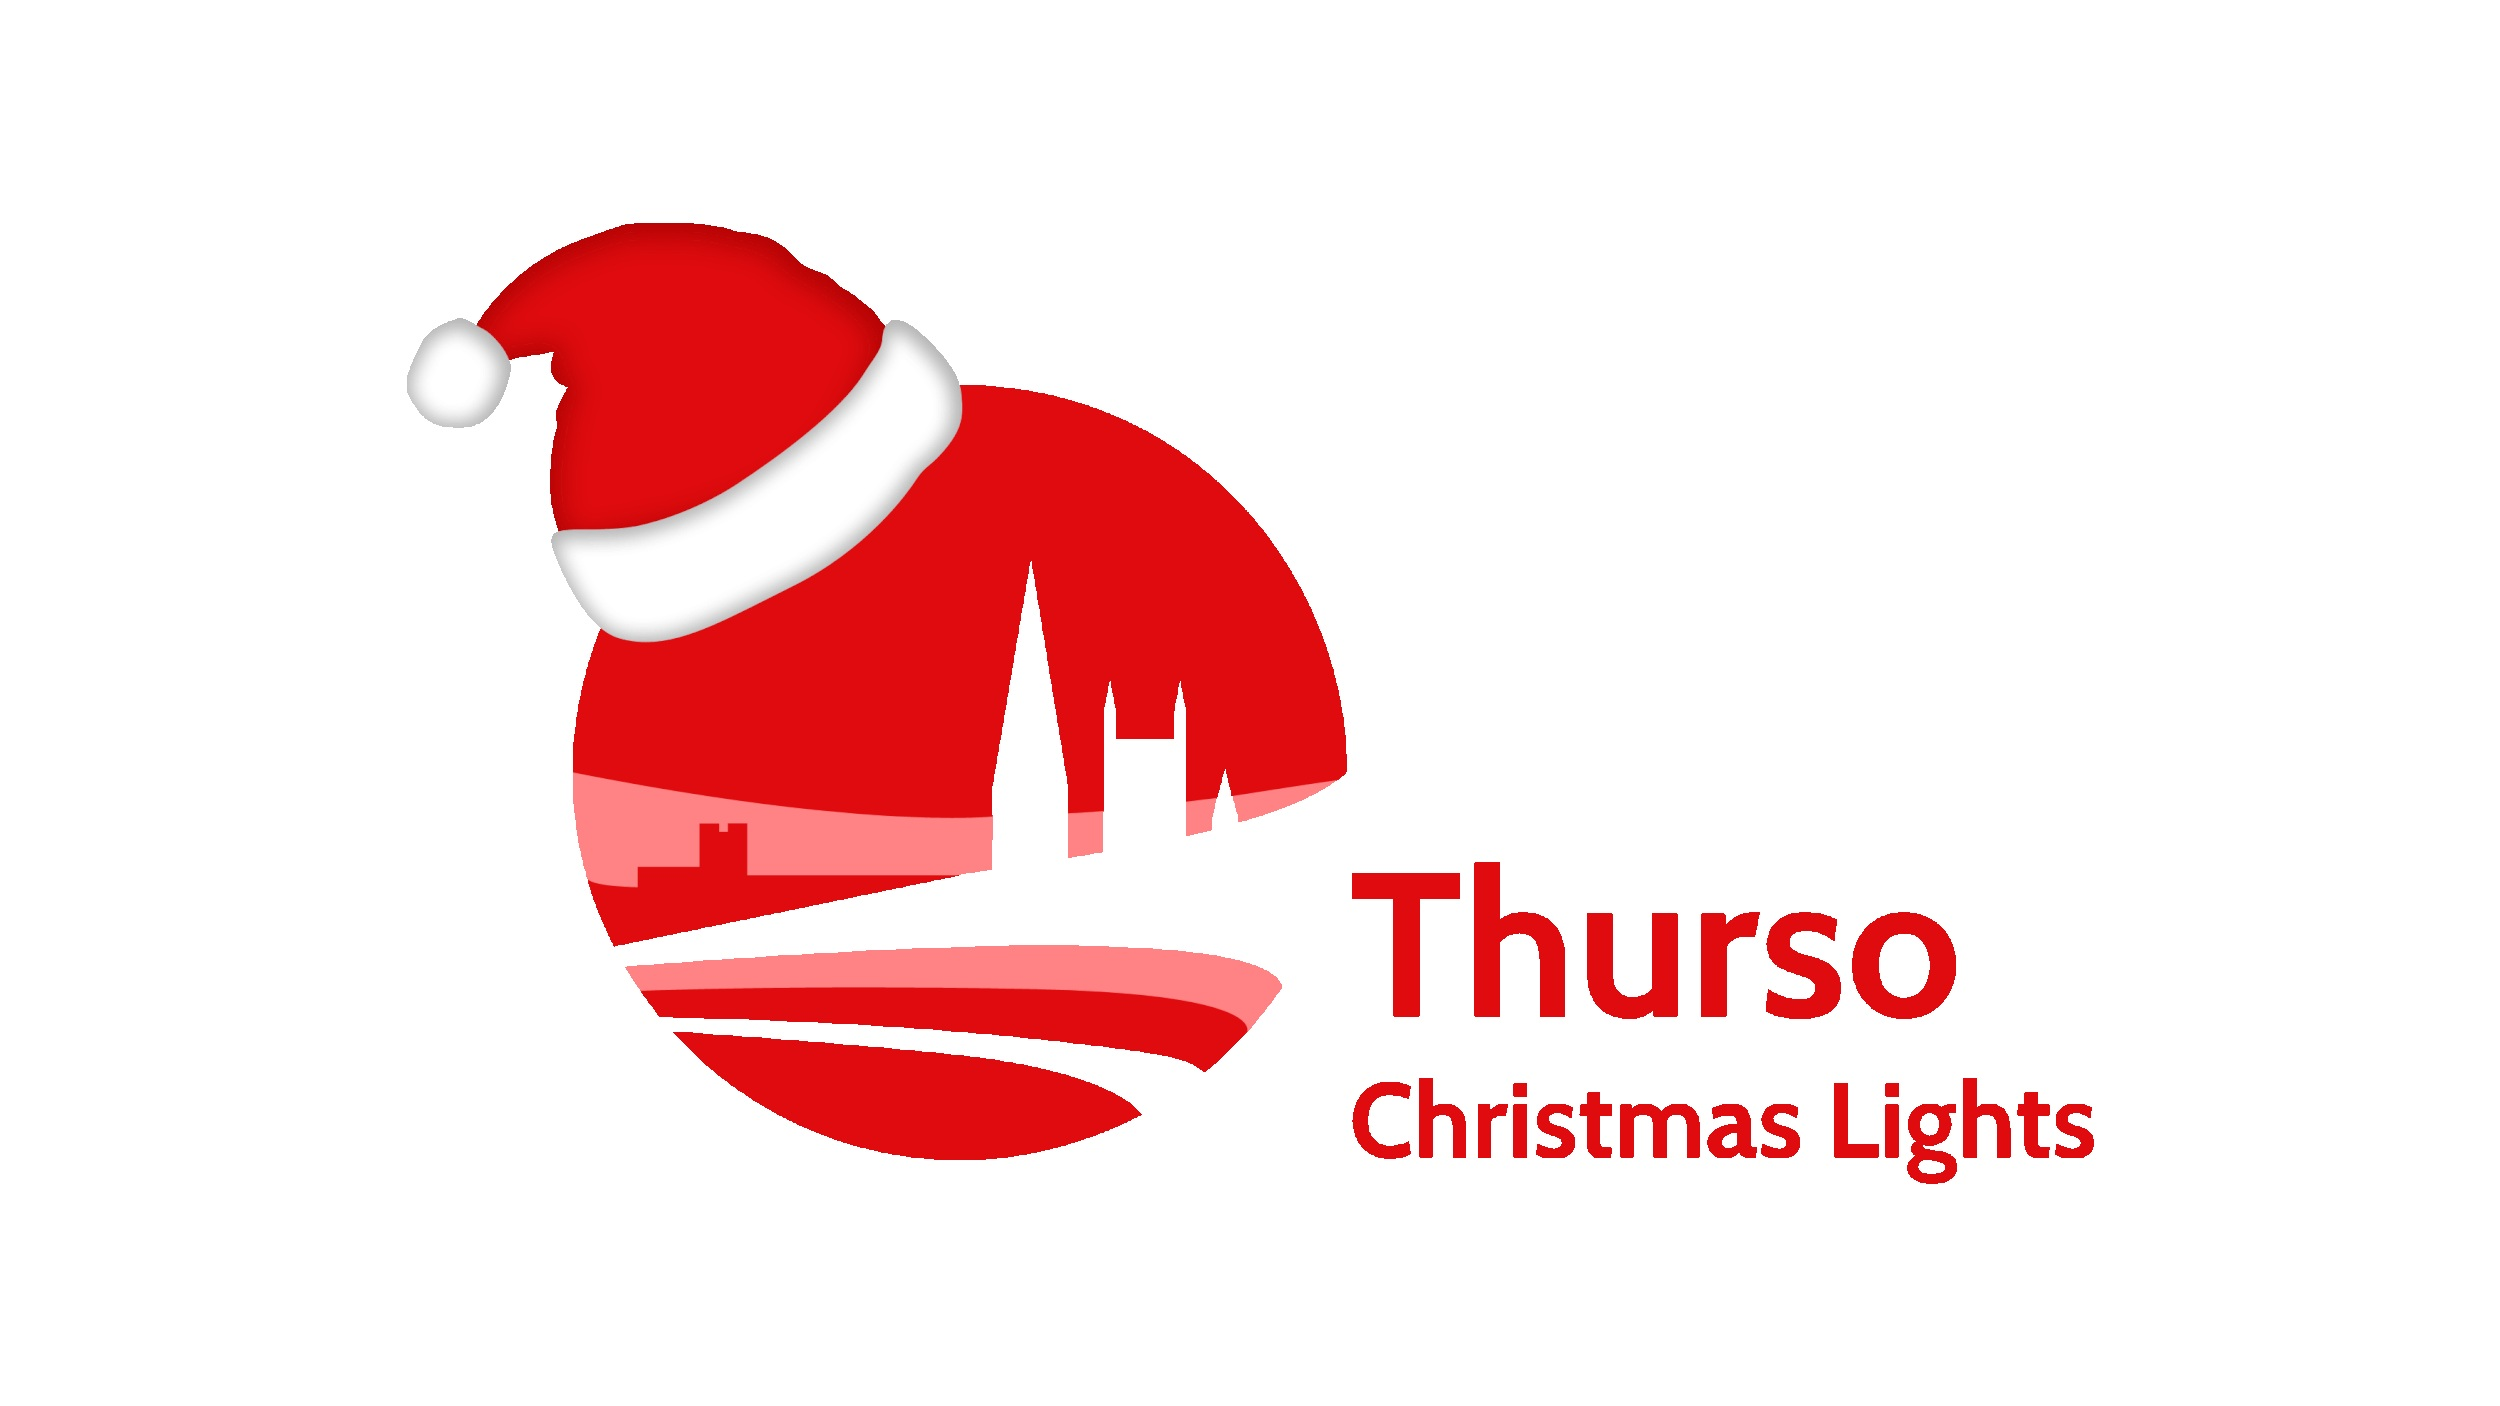 thurso+christmas+lights+logo.jpg